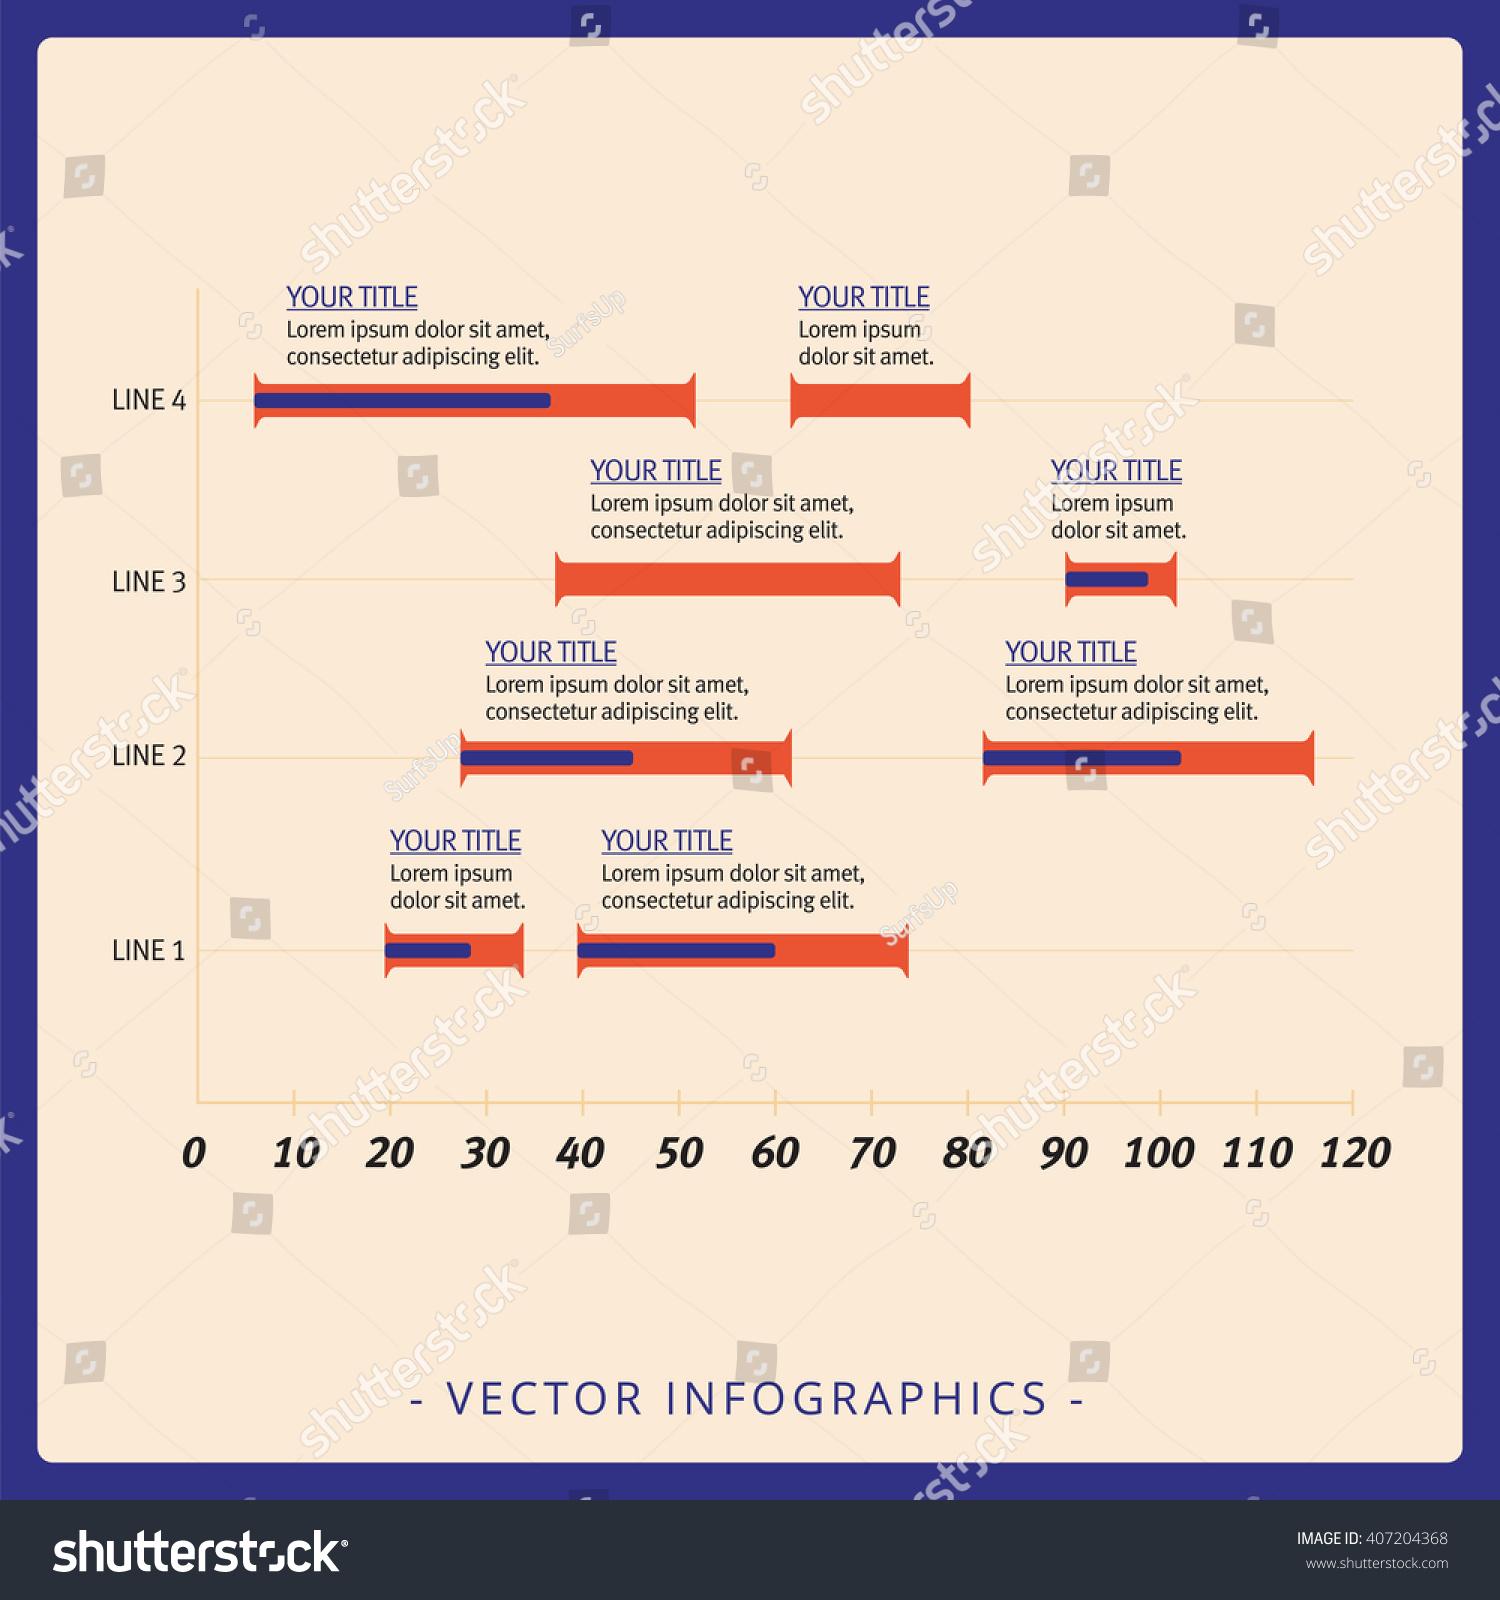 Horizontal Histogram Template Stock Vector 407204368 - Shutterstock